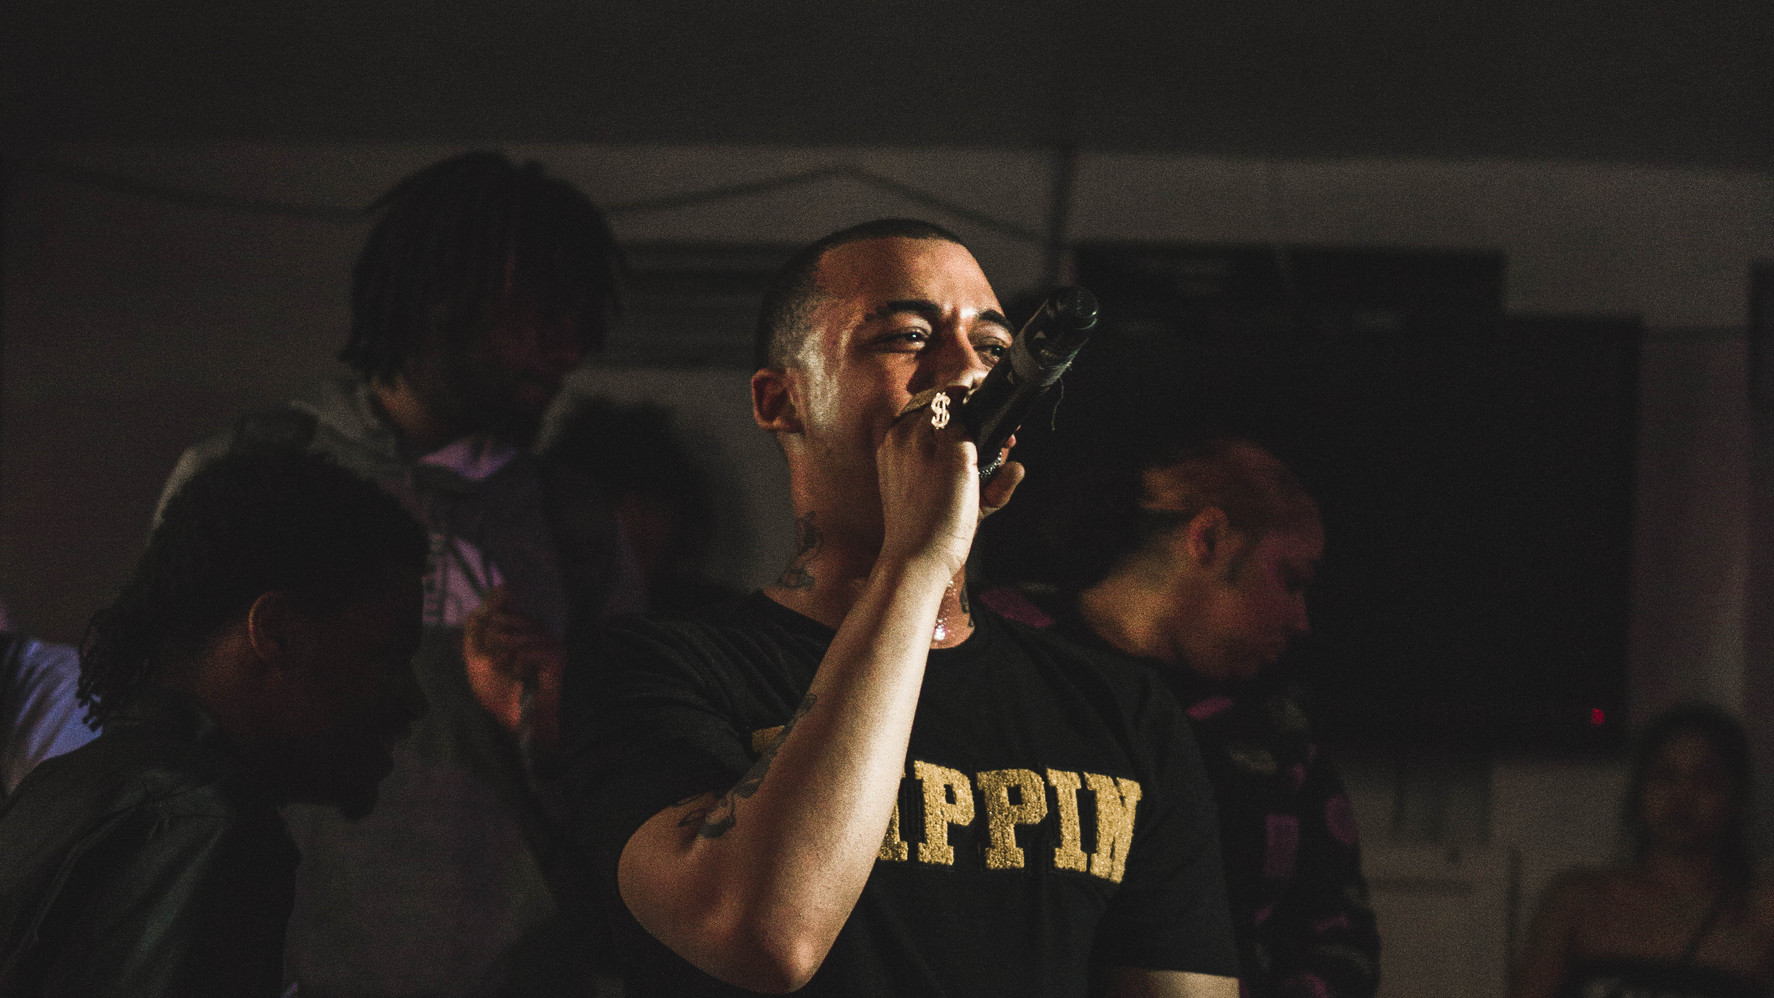 5.31.19 | Almighty Suspect | Complex, Oakland, CA | Photographer: Jason Jeong | Sean Healy